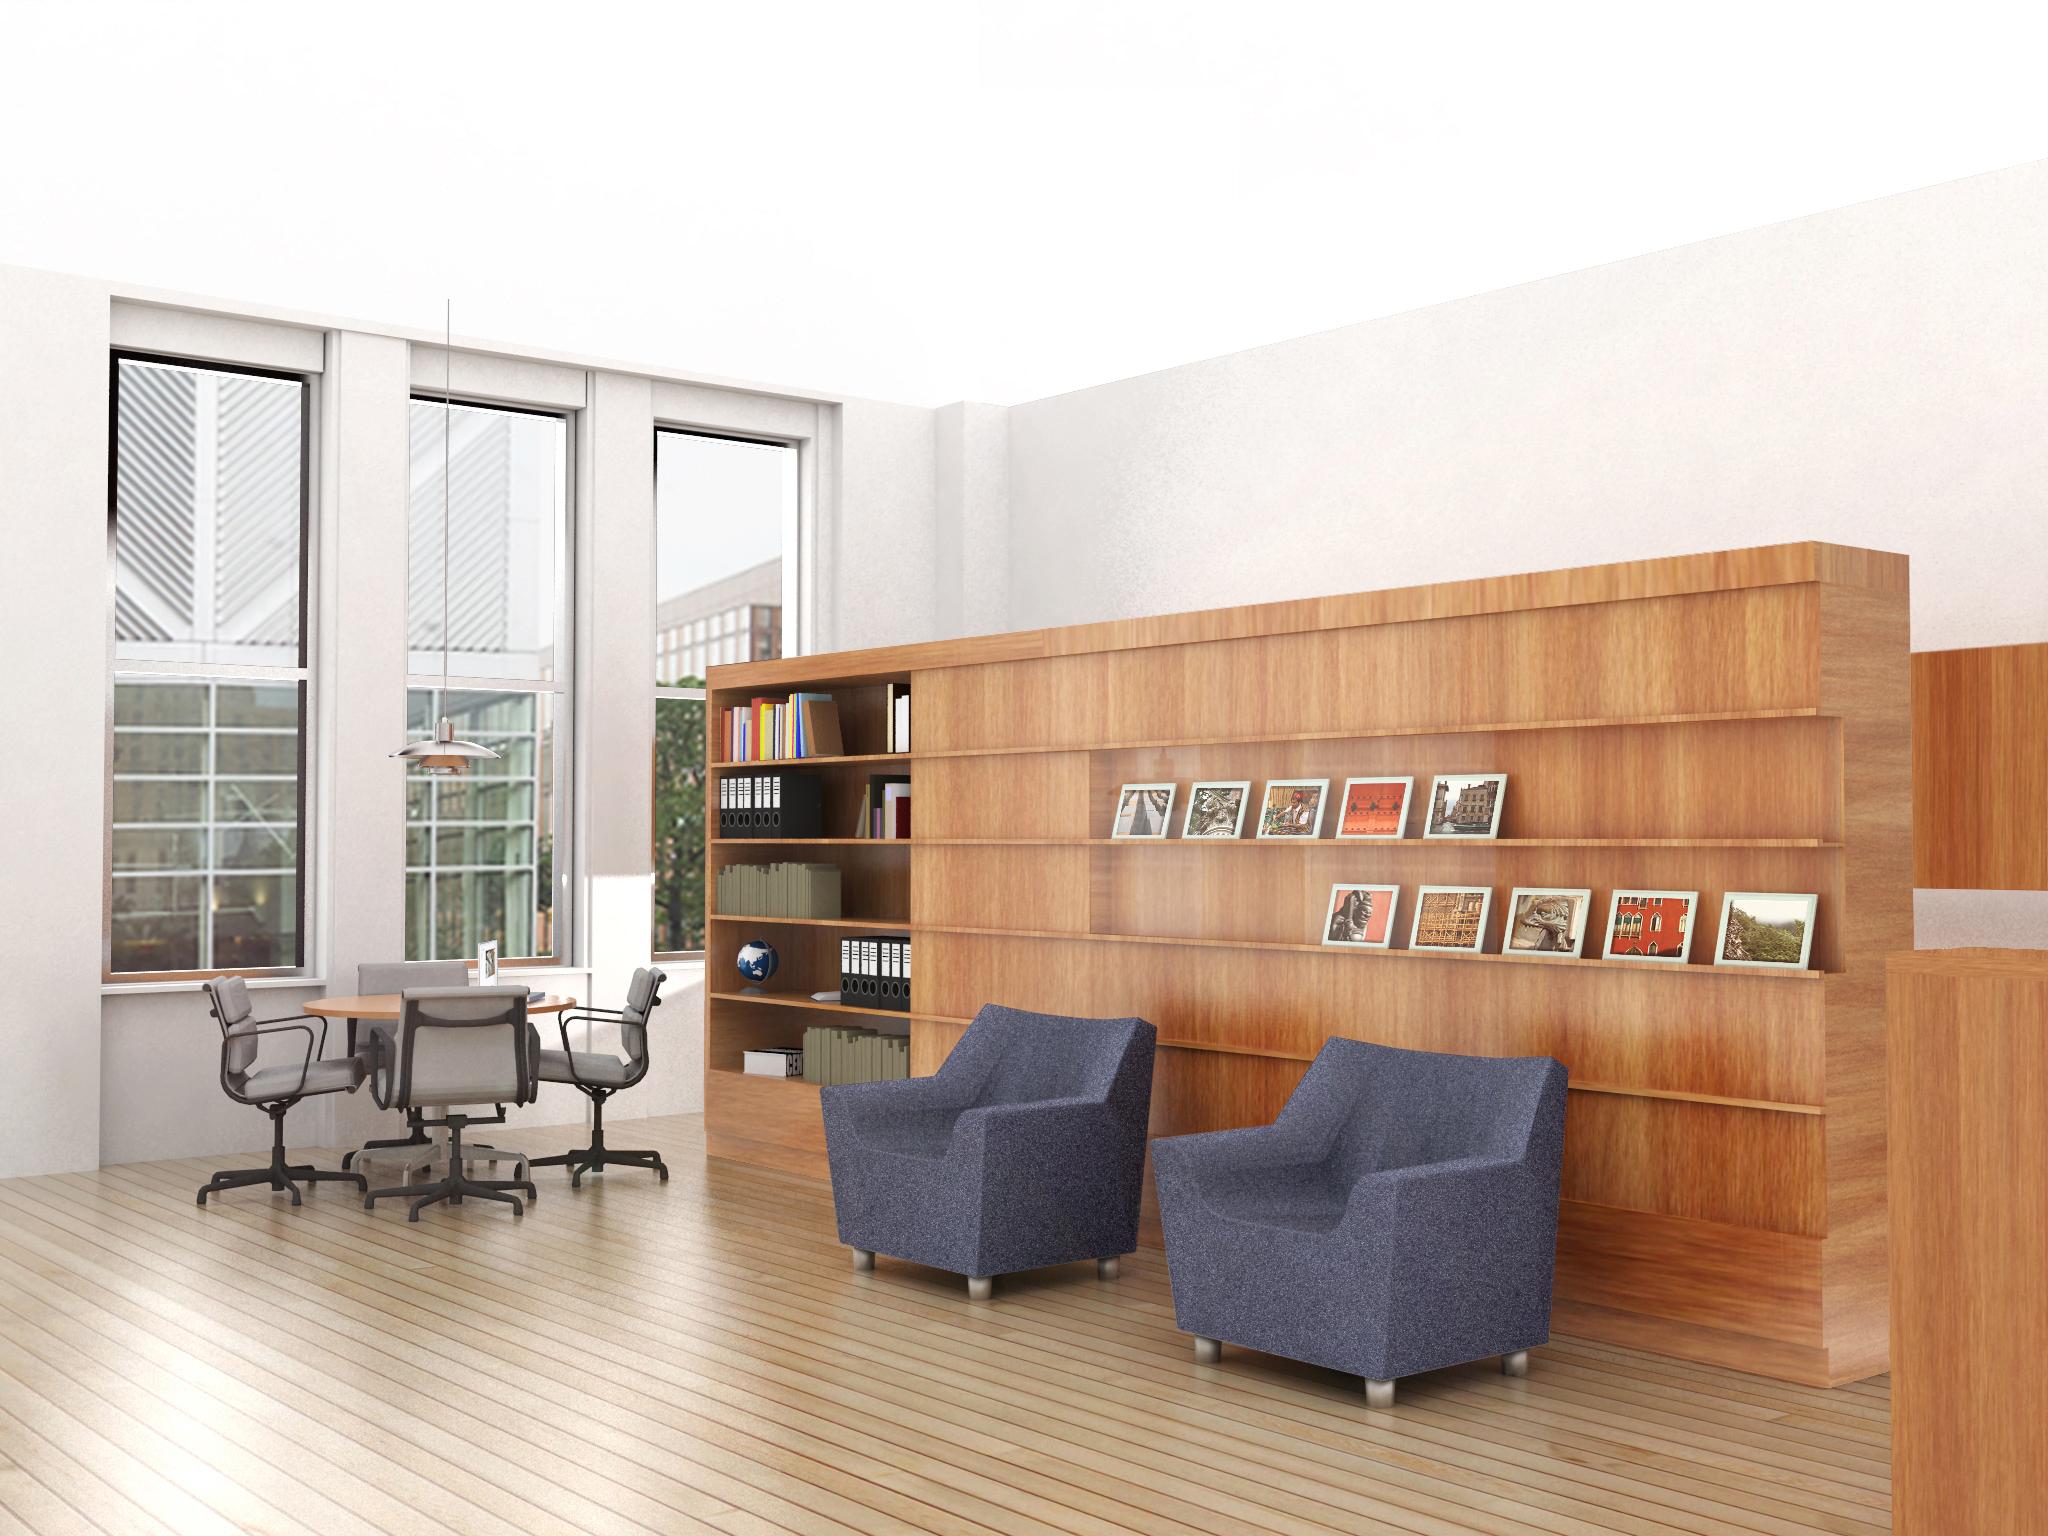 Teachers College, Columbia University // Belmont Freeman Architects